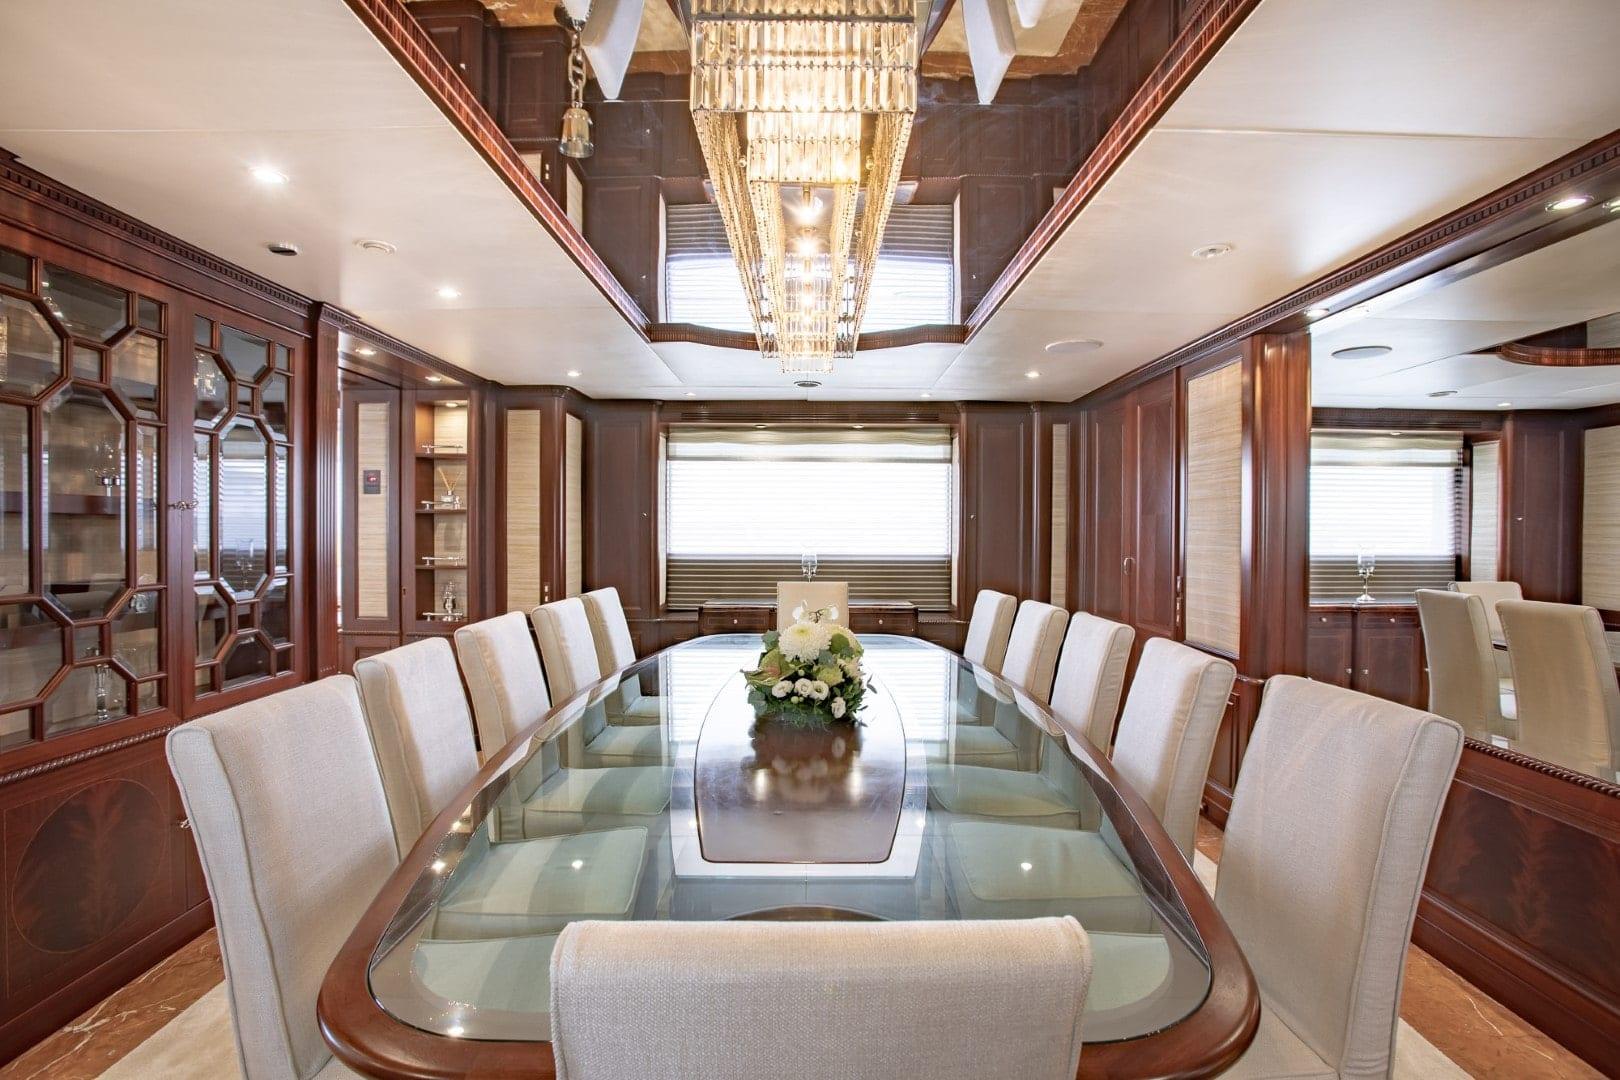 akira-one-motor-yacht-dining-main-salon (2)